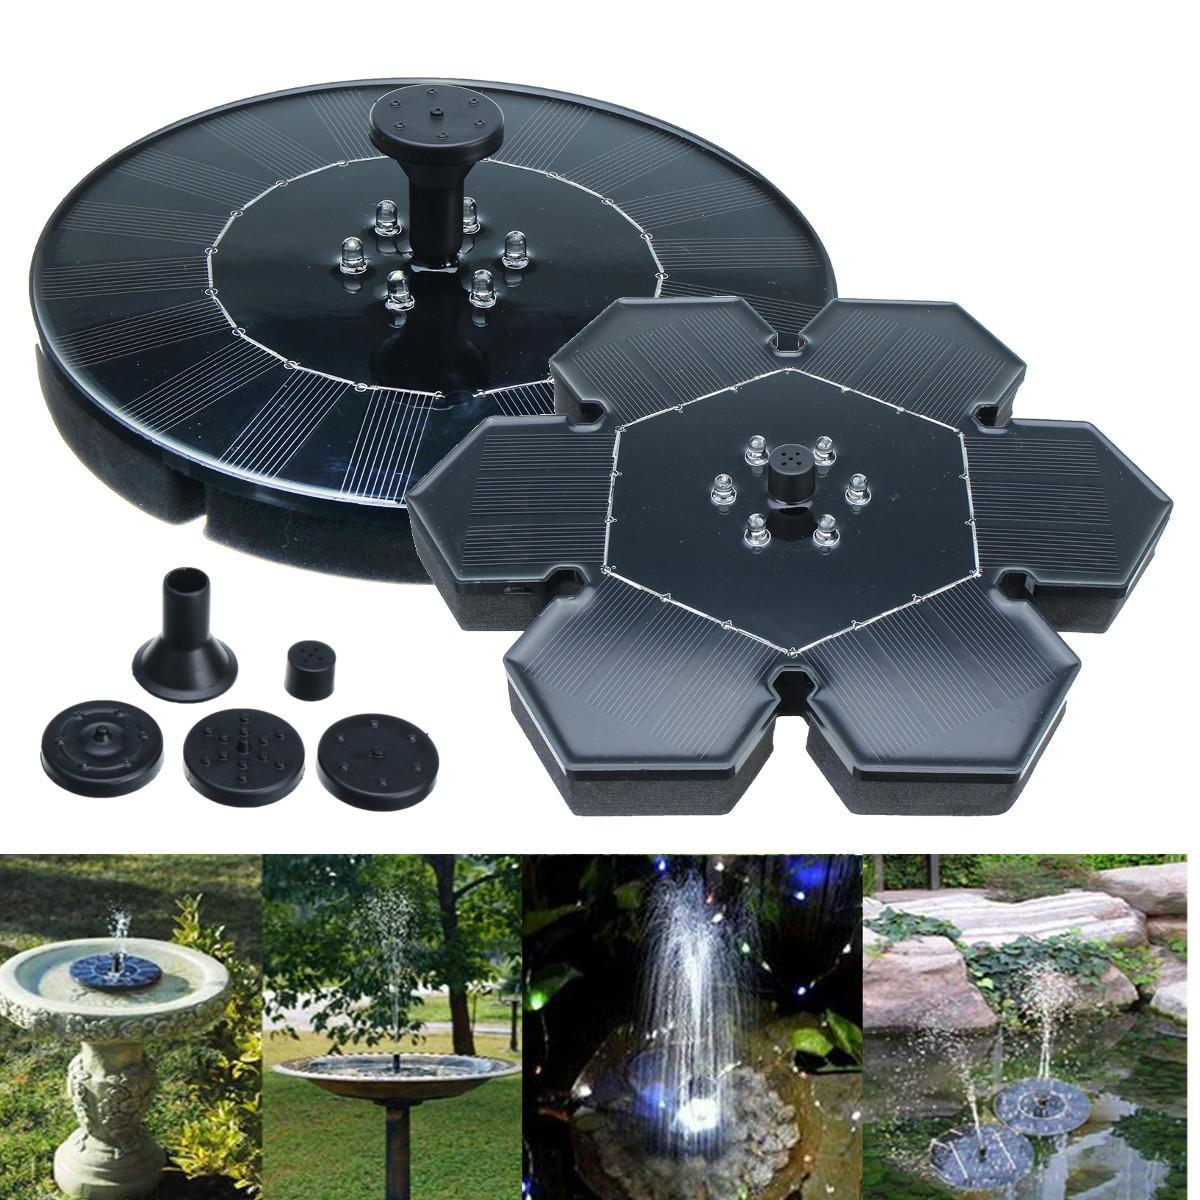 18/22cm Floating Fountain Pump LED Light Solar Power Panel Garden Plants Water Pool Pond Fountain Yard Decoration Waterproof